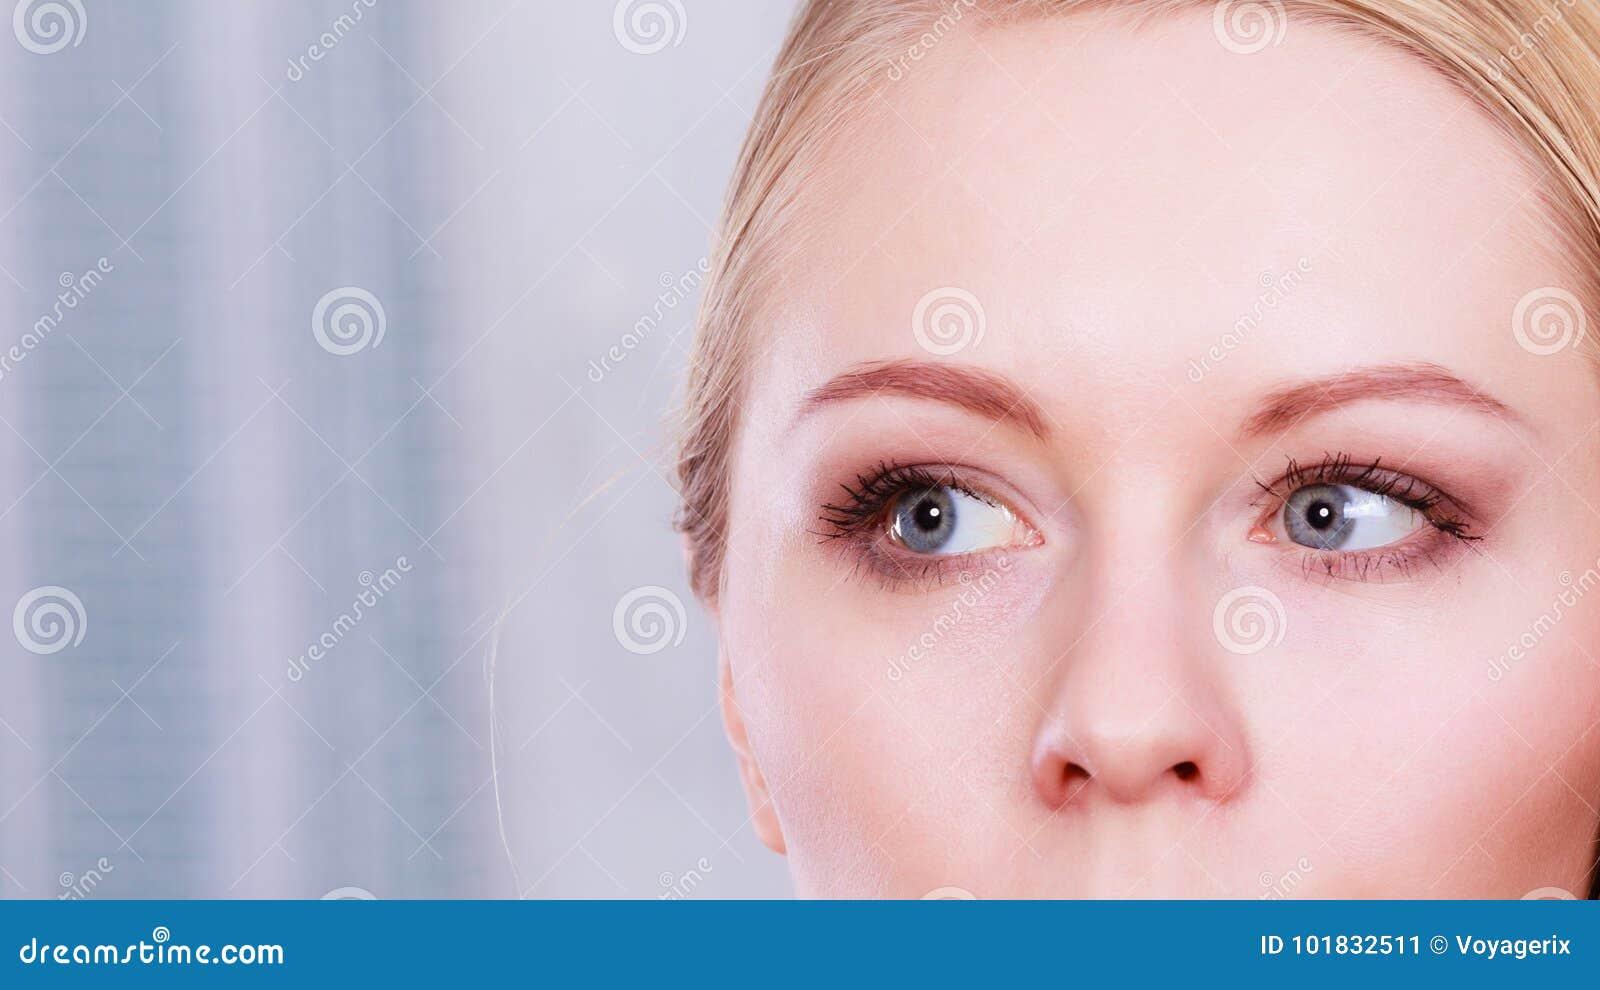 e4d75ebbb Grises Imagen De Mujer Rubia Con Azules Retrato Ojos La Los wOX8nk0PN